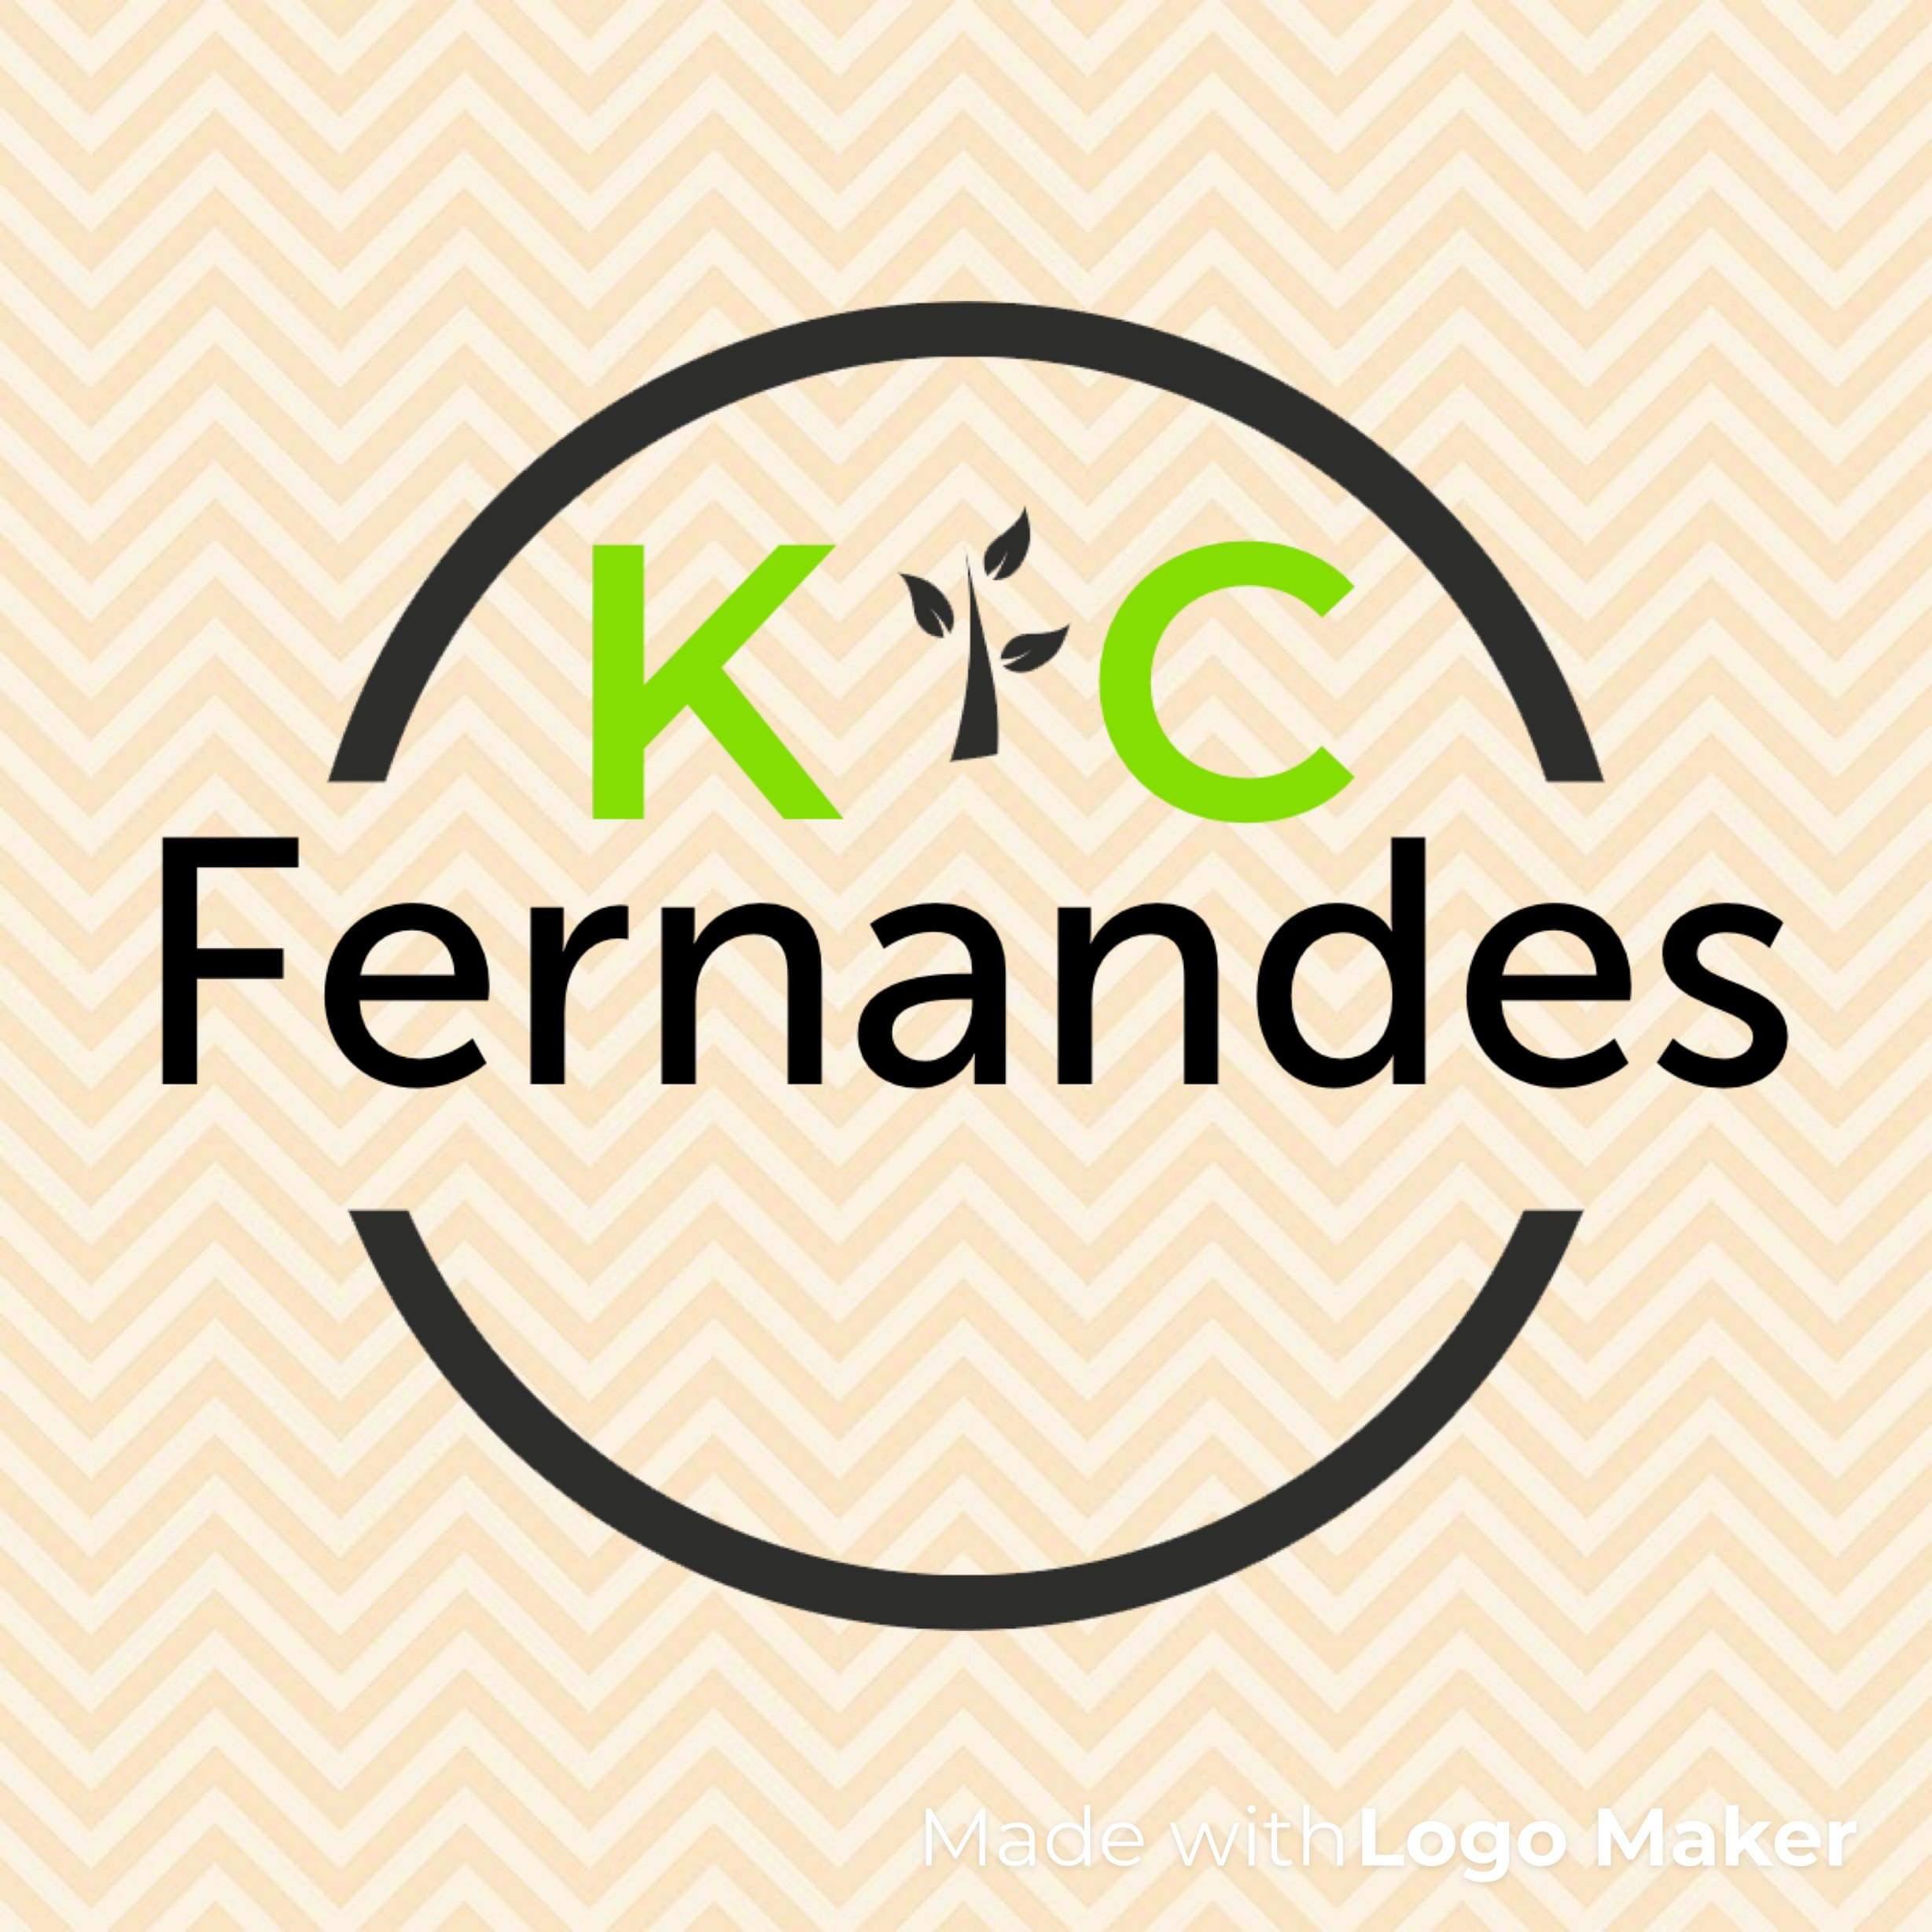 K C Fernandes - Construções de Jardins